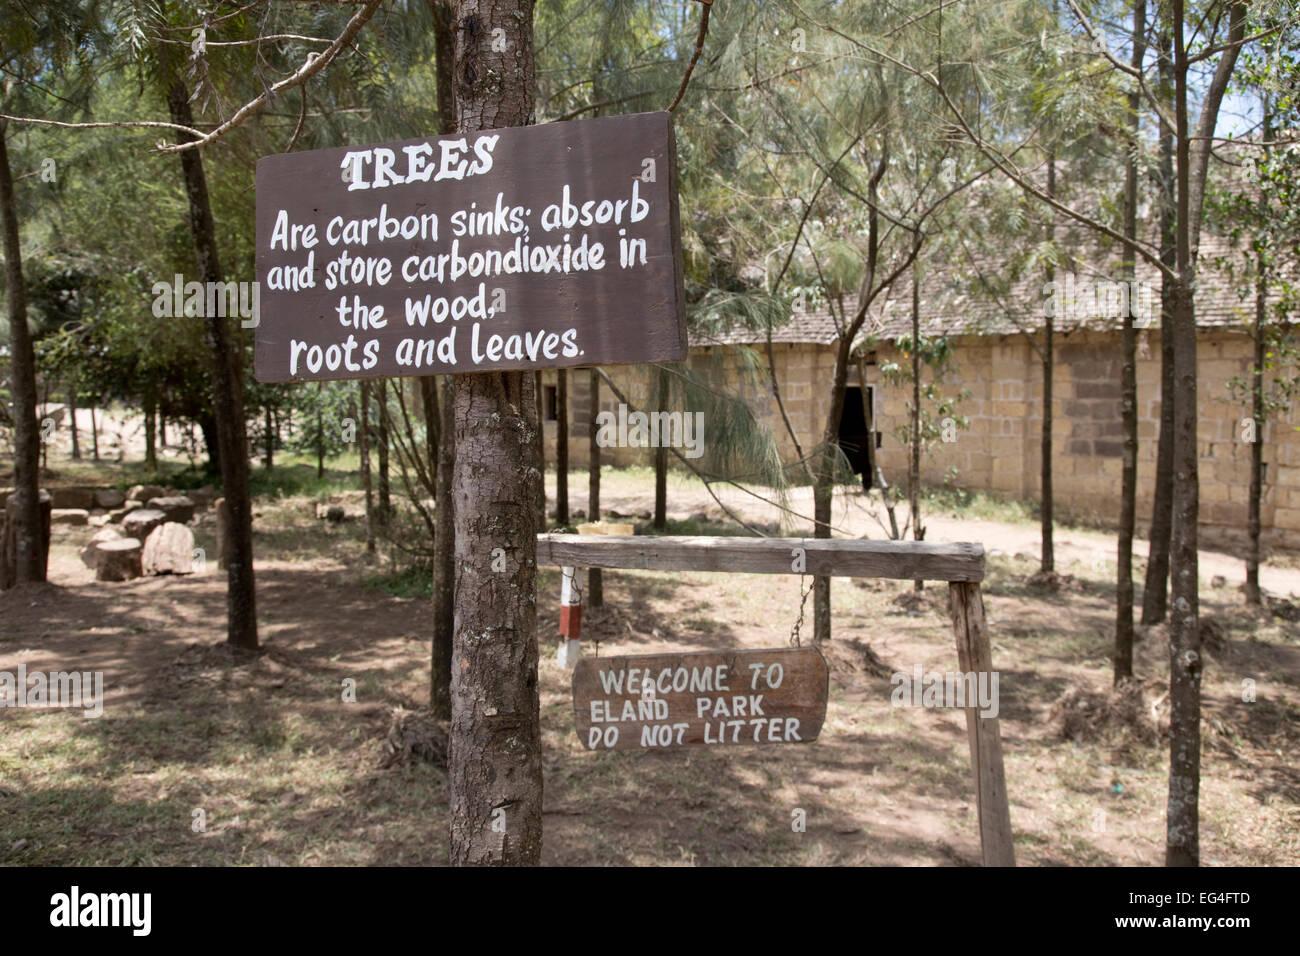 Avviso Gli alberi assorbono anidride carbonica Lungalunga Scuola Primaria Gilgil Kenya Immagini Stock